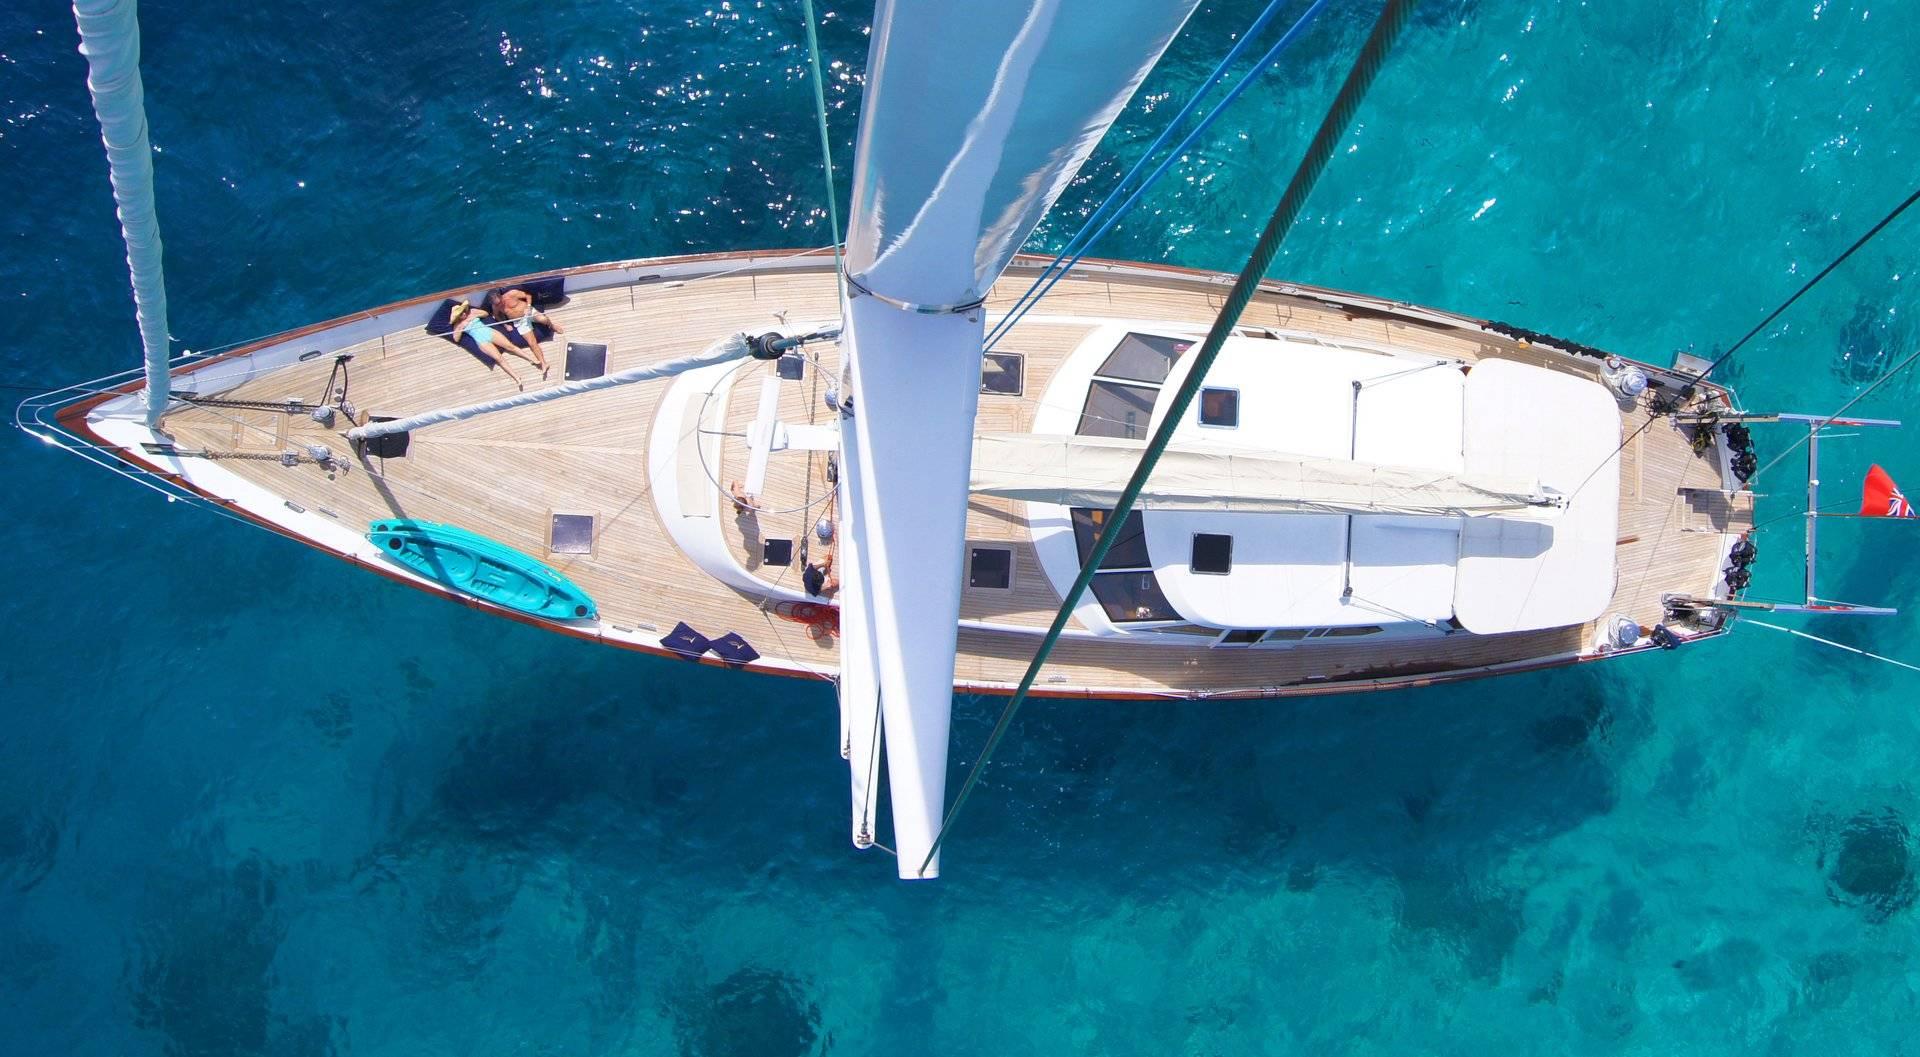 11b phuket yacht charter sy asia 23-04-2016